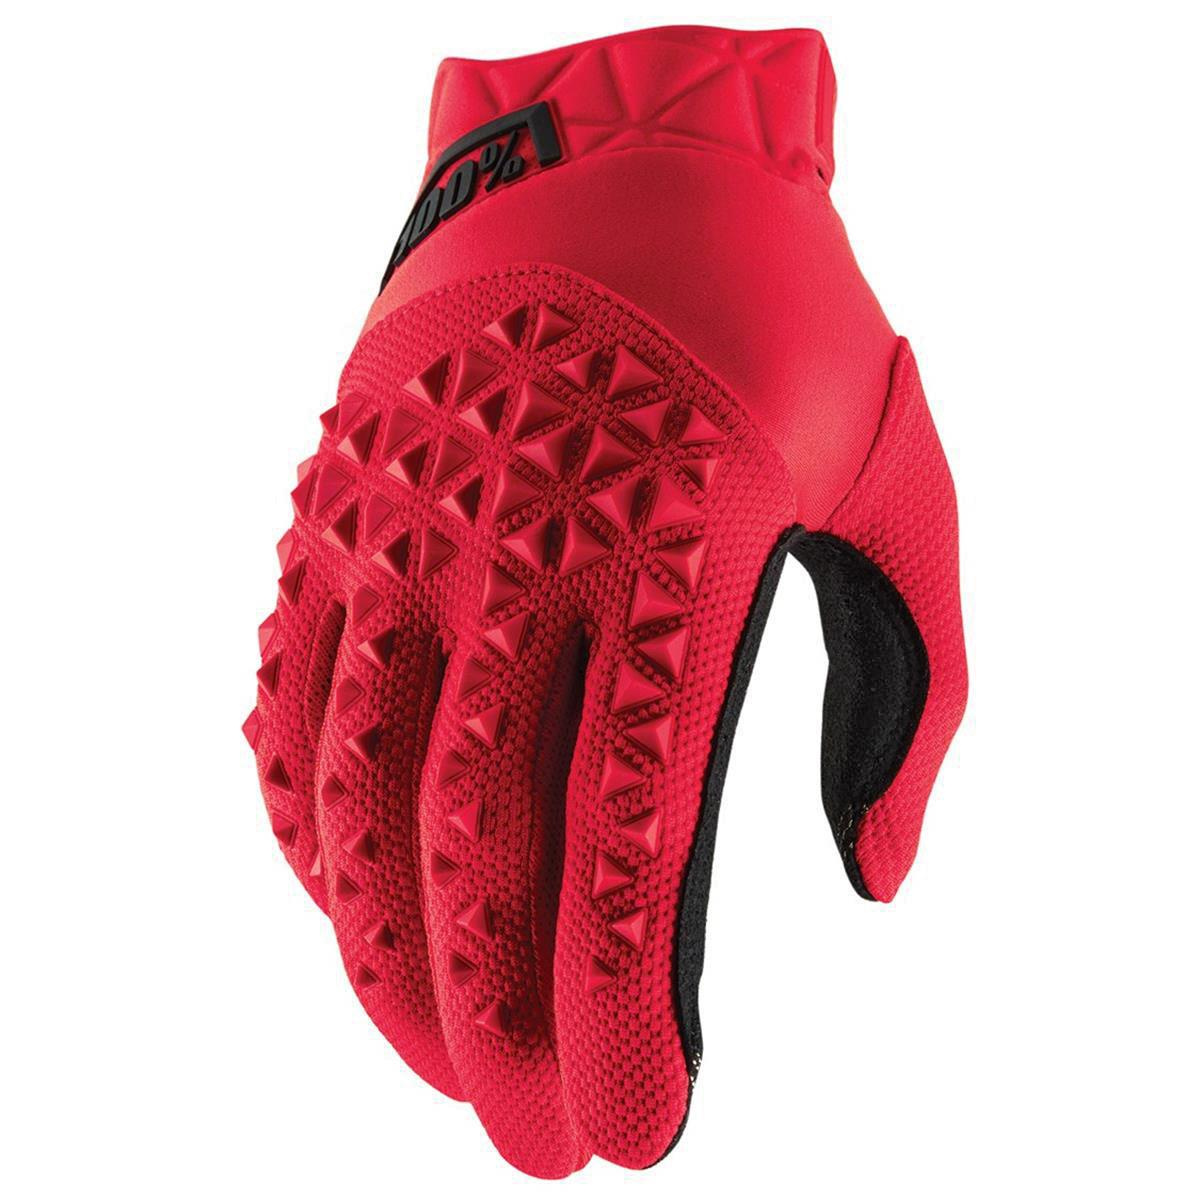 100% Bike-Handschuhe Airmatic Rot/Schwarz